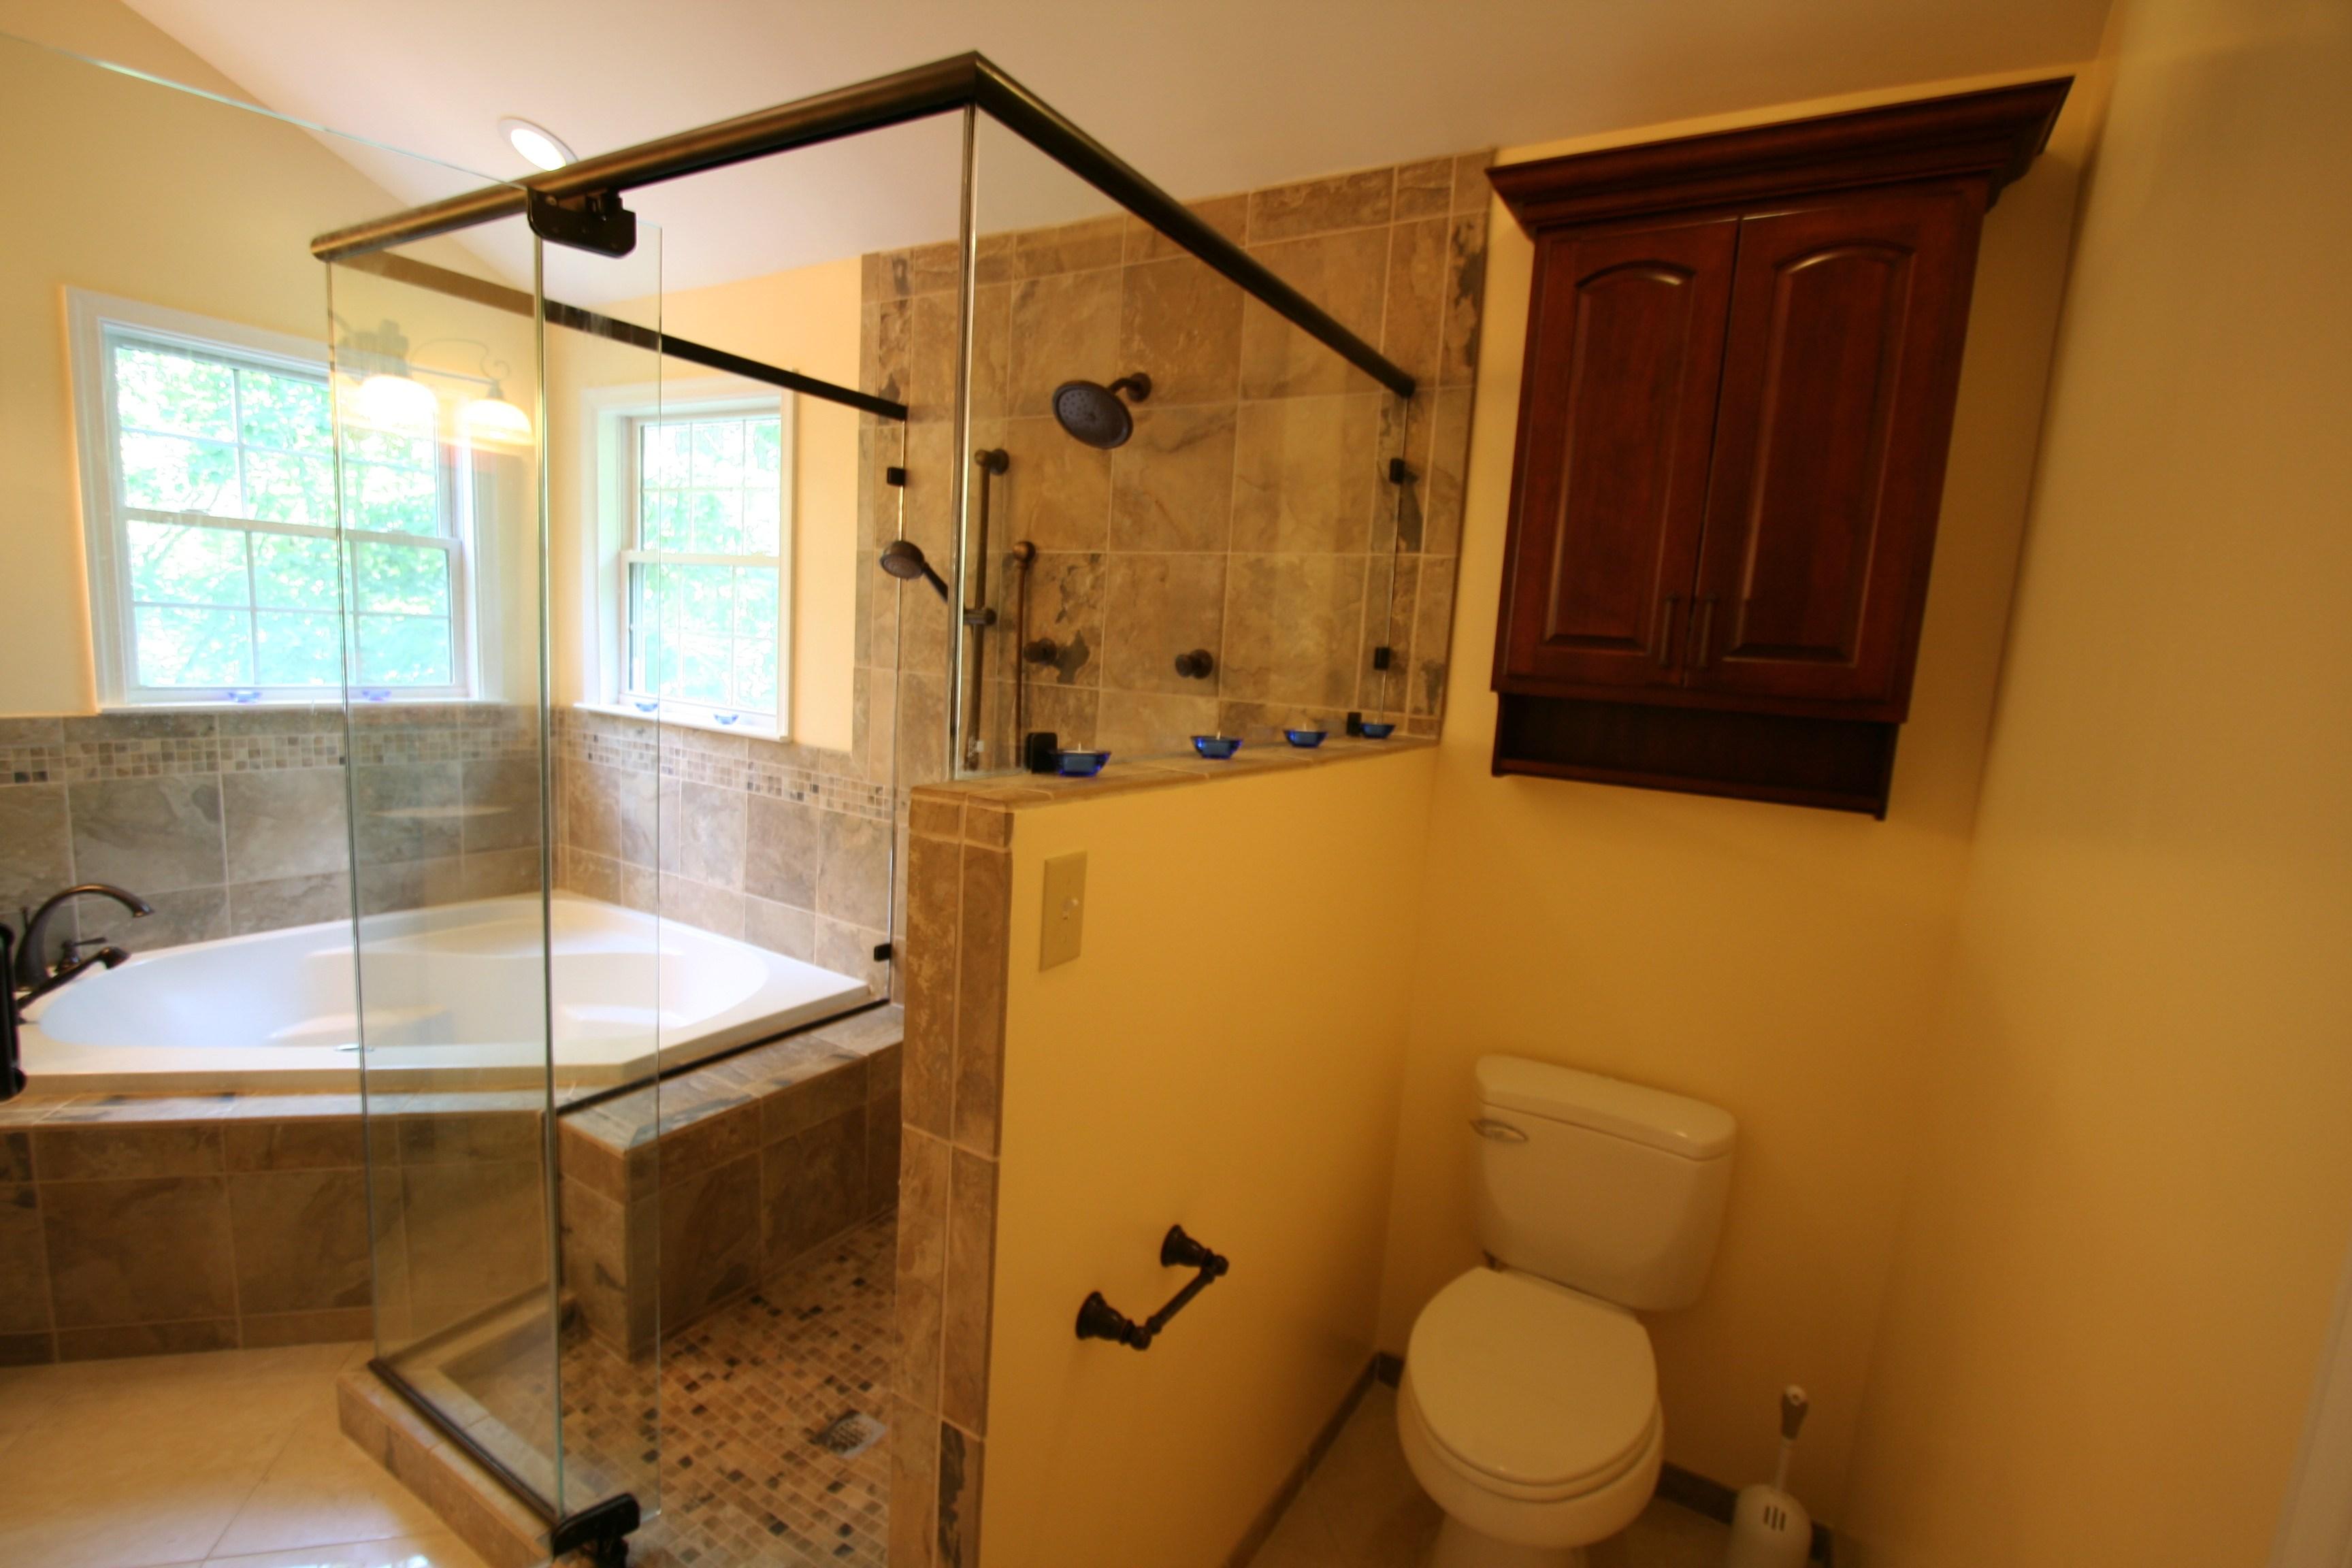 New Look Kitchen Bath Design Clinton Md 20735